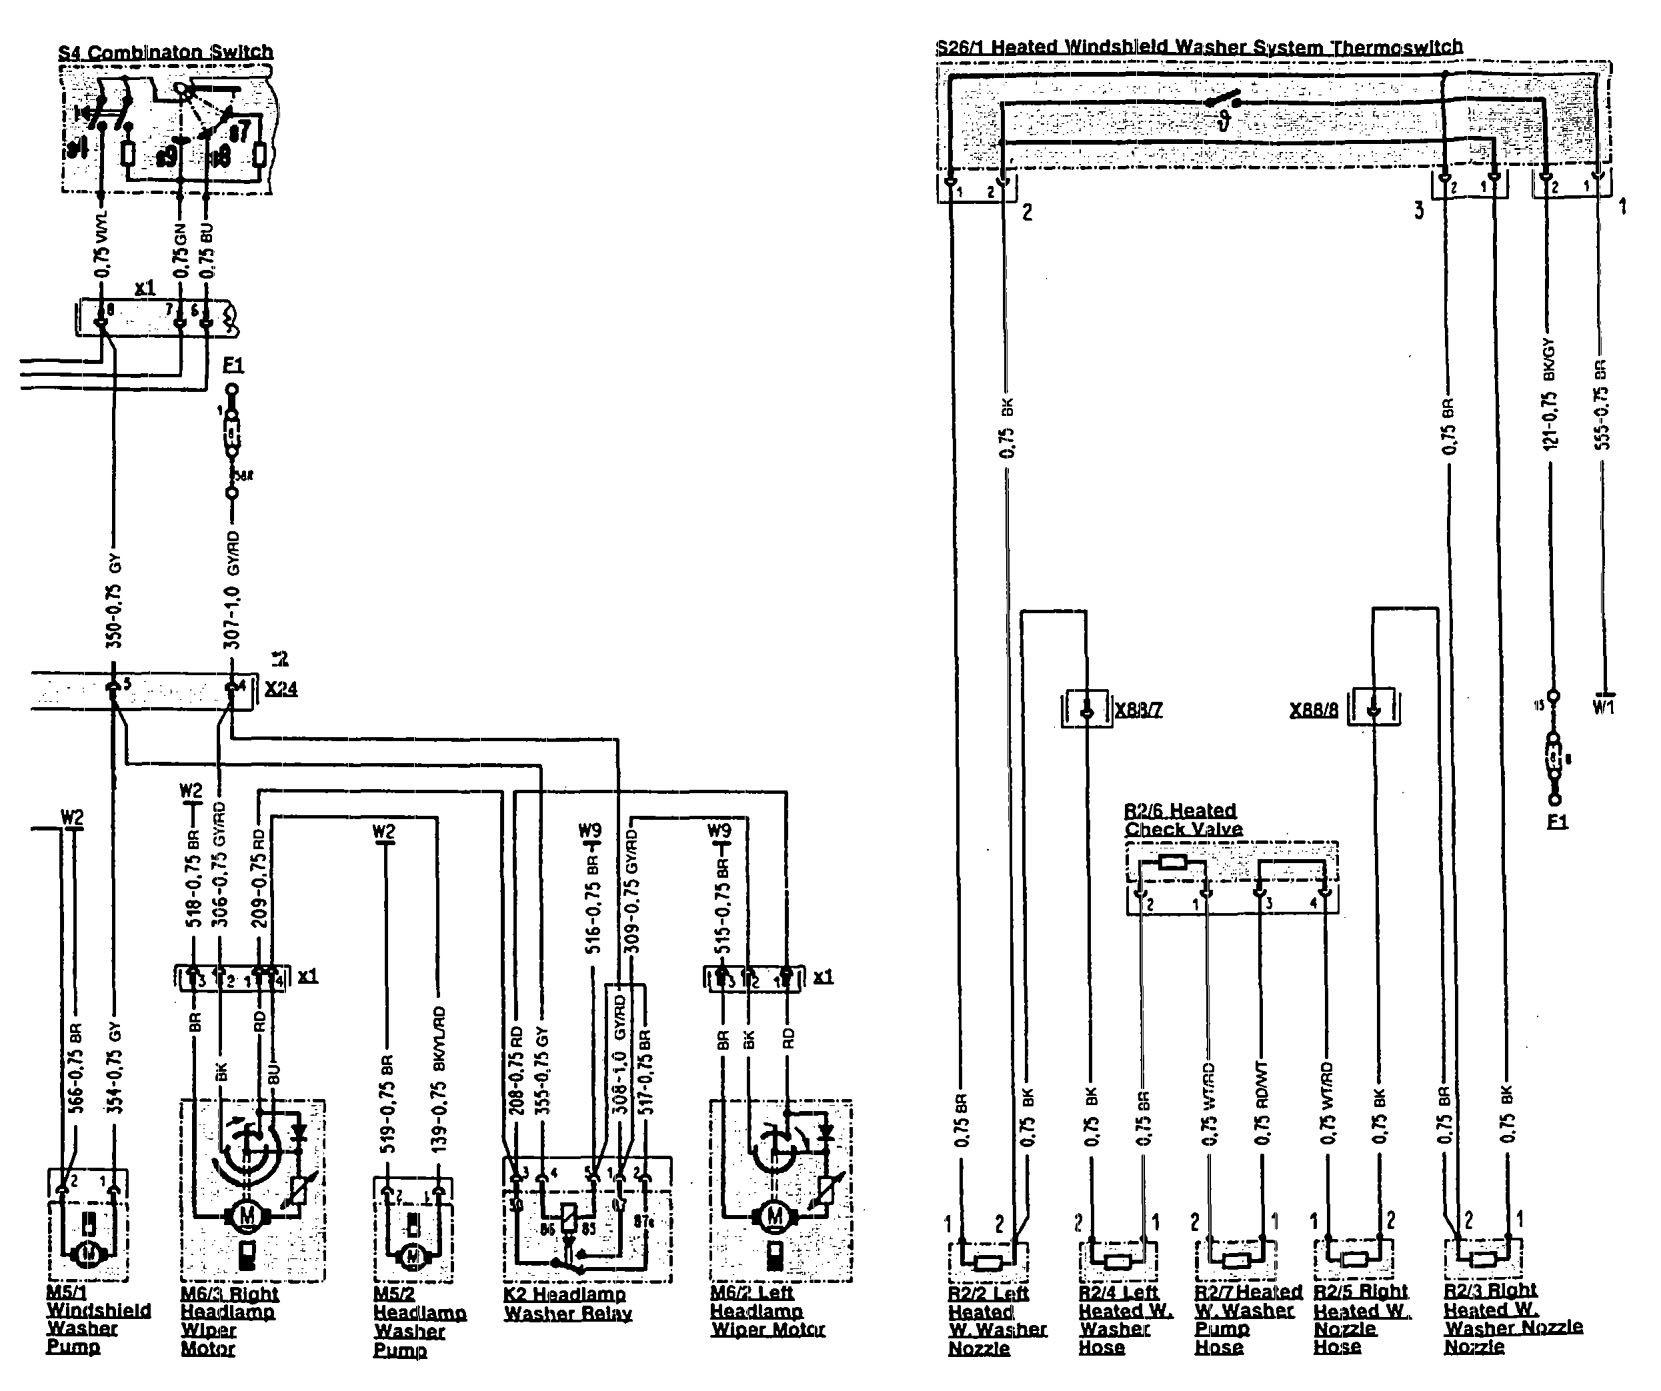 1999 Volvo S70 Wiring Diagram - Toyskids.co • on mercury milan wiring diagram, bmw e90 wiring diagram, volkswagen cabrio wiring diagram, saturn aura wiring diagram, chevrolet volt wiring diagram, volvo amazon wiring diagram, chevrolet hhr wiring diagram, chrysler crossfire wiring diagram, volvo 850 water pump, volvo 850 suspension, pontiac trans sport wiring diagram, volkswagen golf wiring diagram, honda ascot wiring diagram, dodge omni wiring diagram, mercedes e320 wiring diagram, volvo 850 shop manual, porsche cayenne wiring diagram, volvo ignition wiring diagram, geo storm wiring diagram, mitsubishi starion wiring diagram,